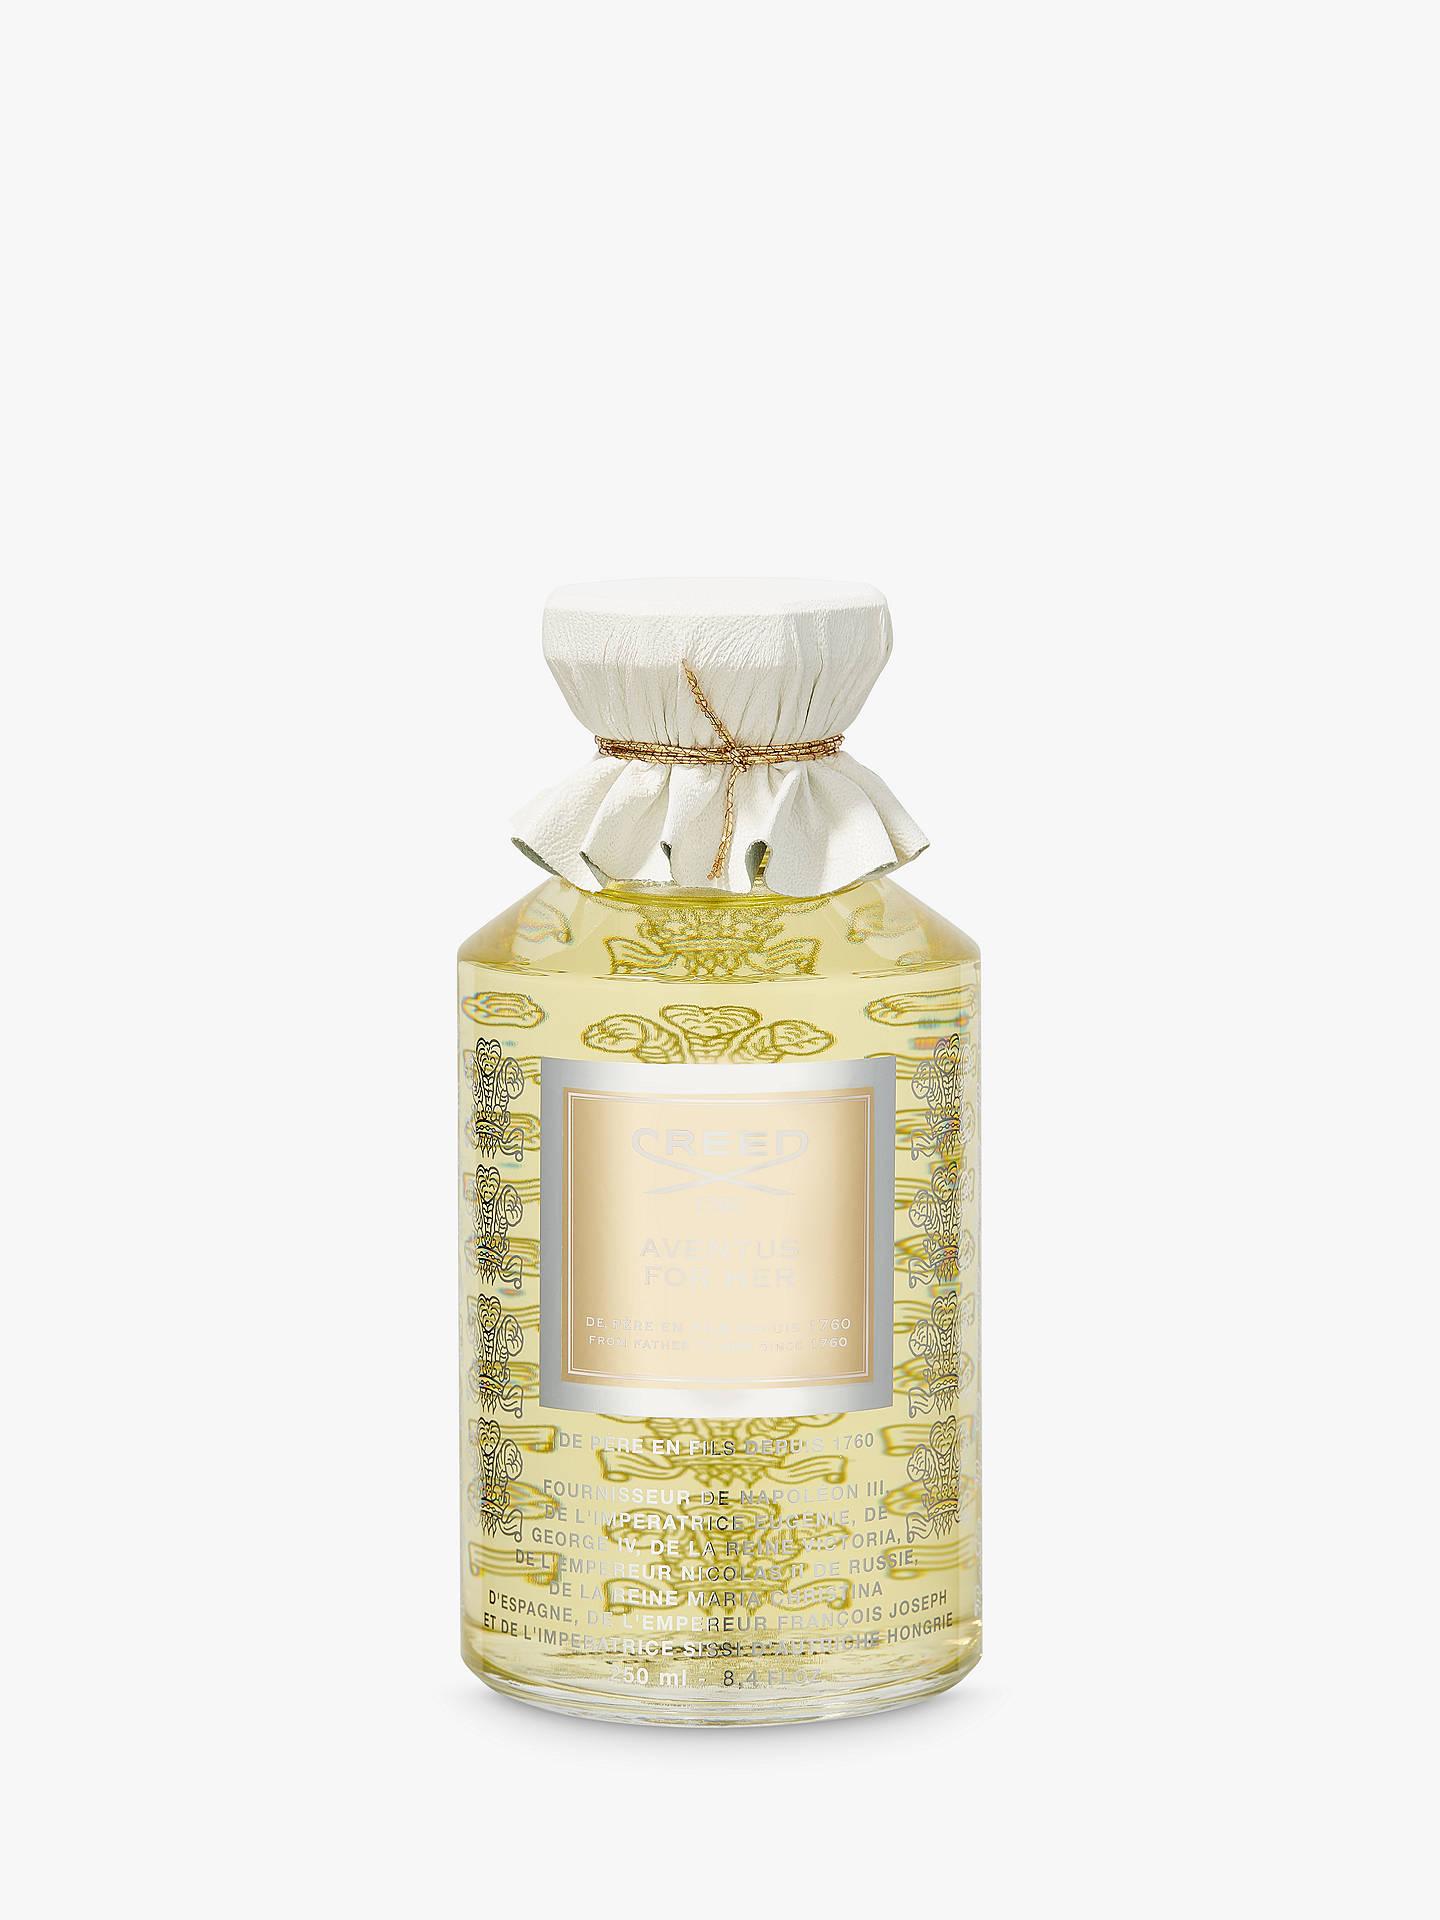 Creed Aventus For Her Eau De Parfum 250ml At John Lewis Partners Original Adidas Get Ready Buycreed Online